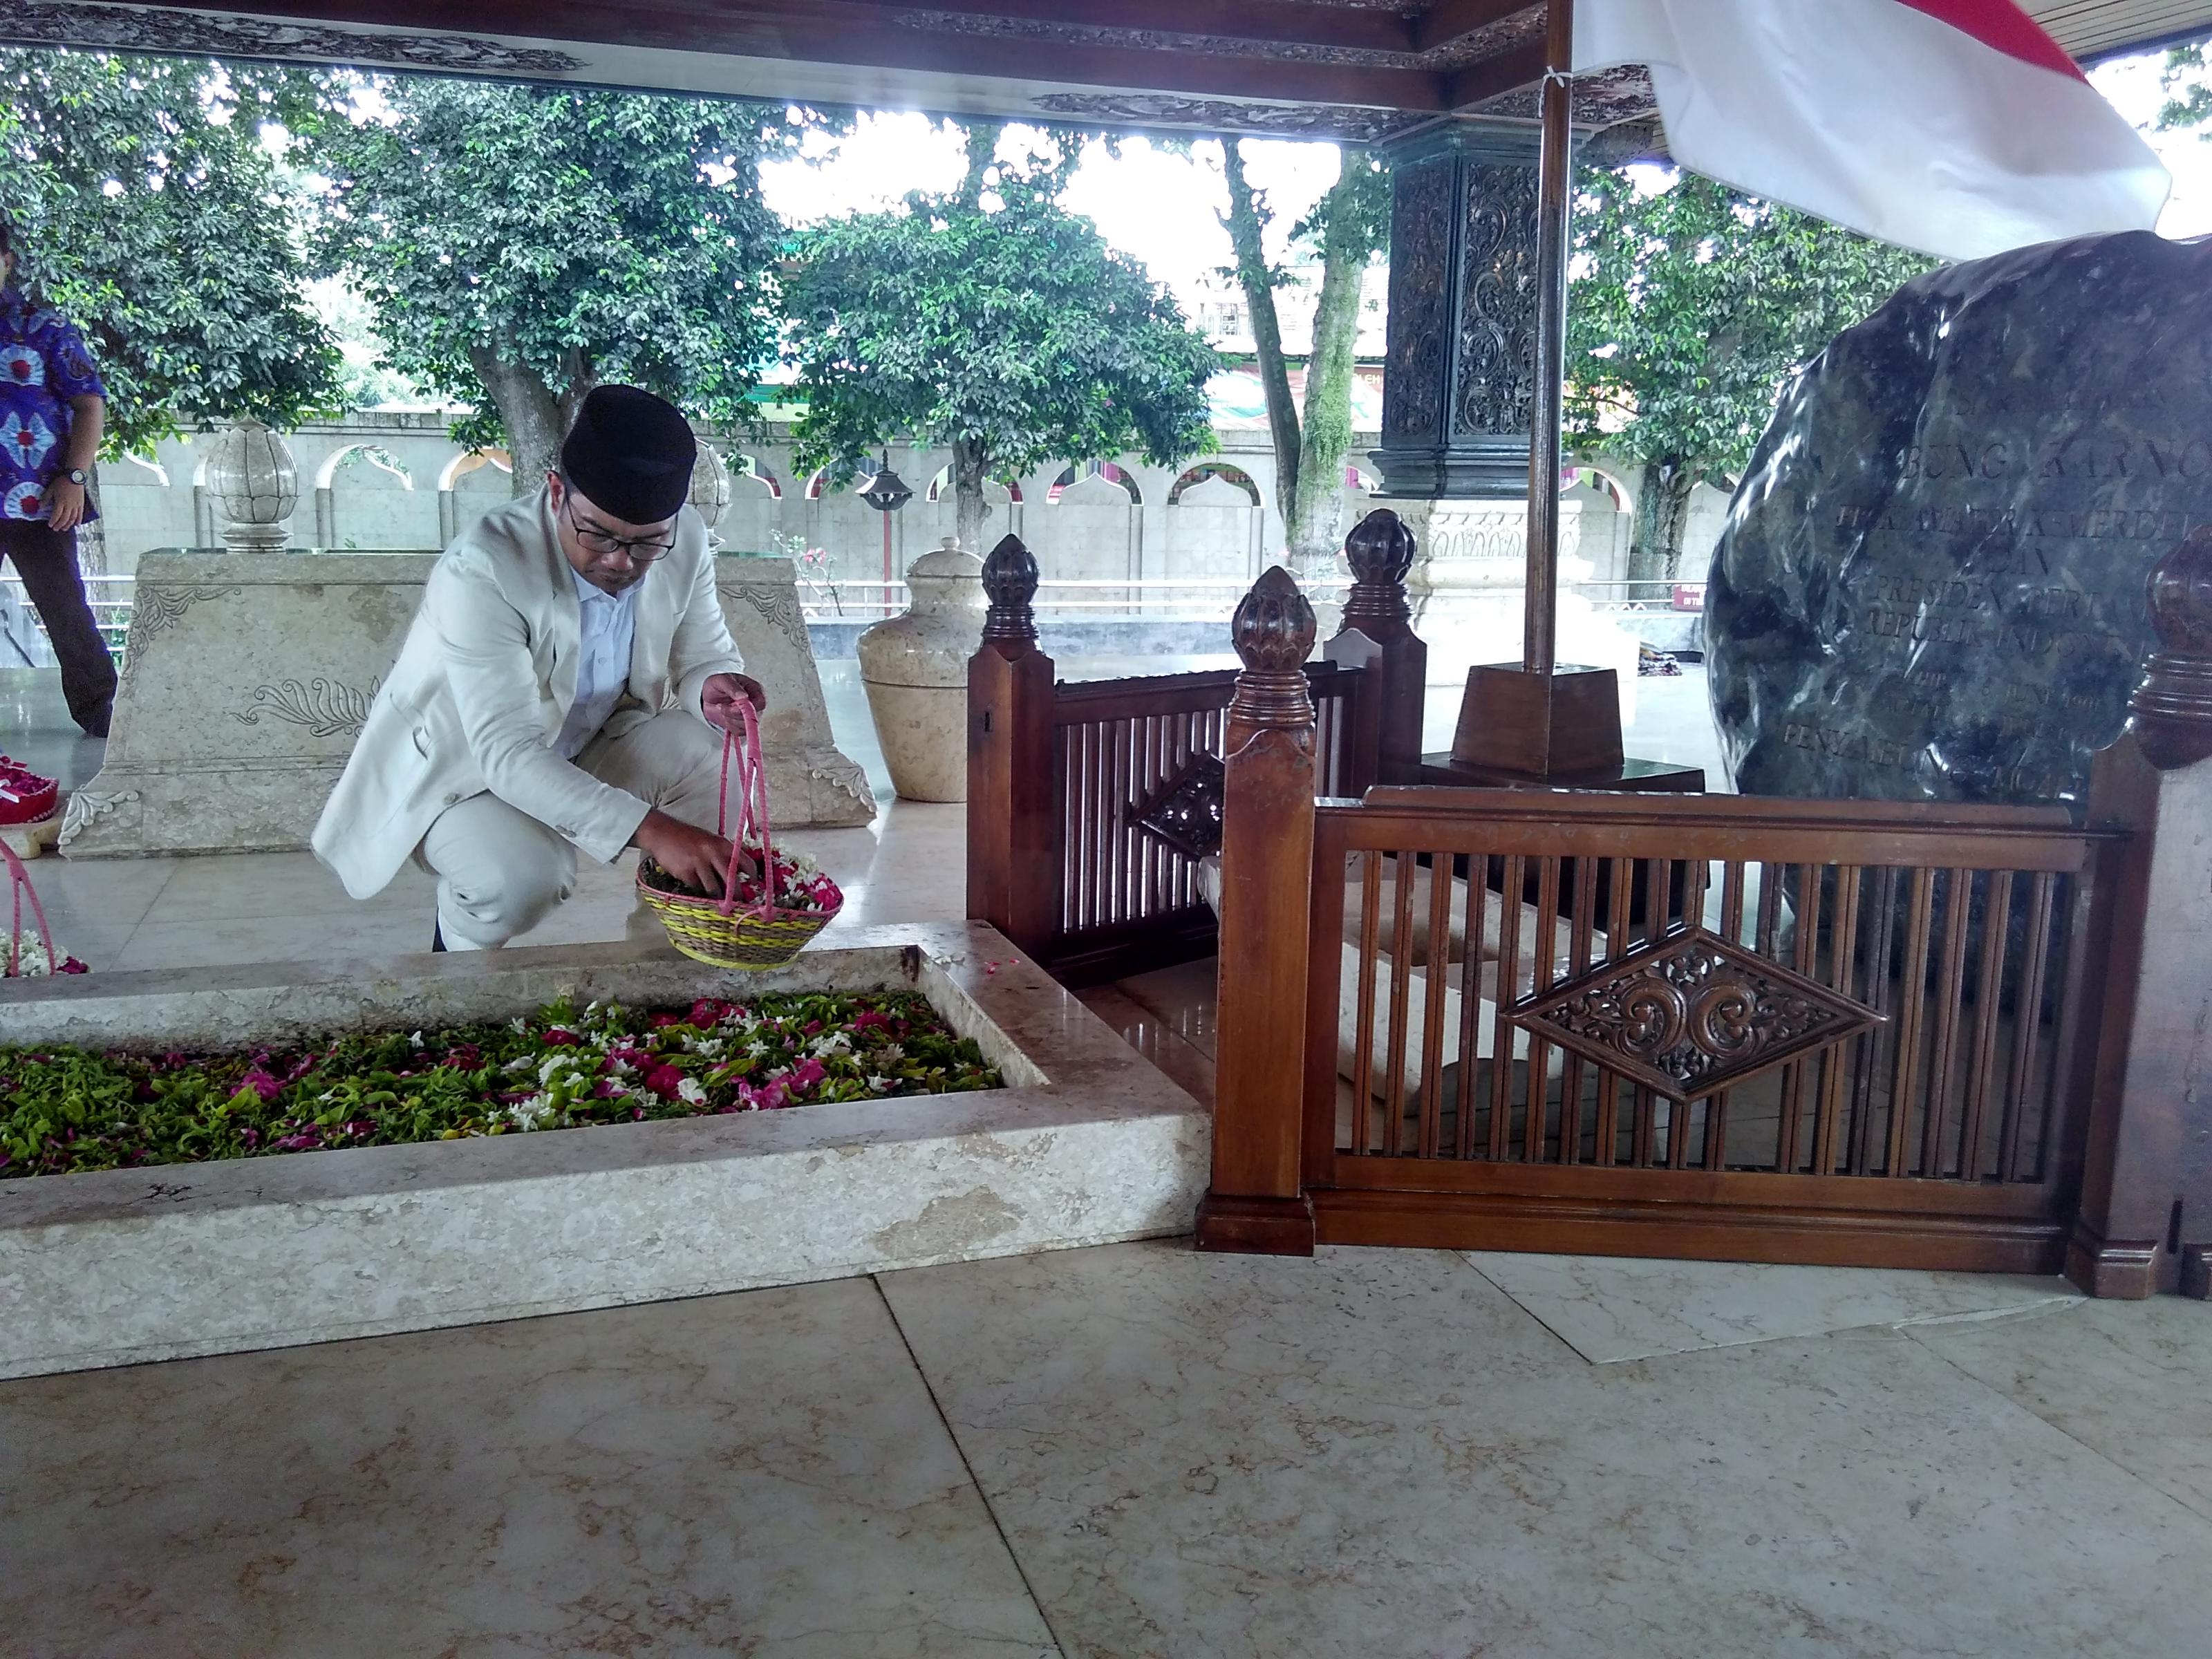 Kamil Ziarah Makam Bung Karno Kota Blitar Ridwan Kab